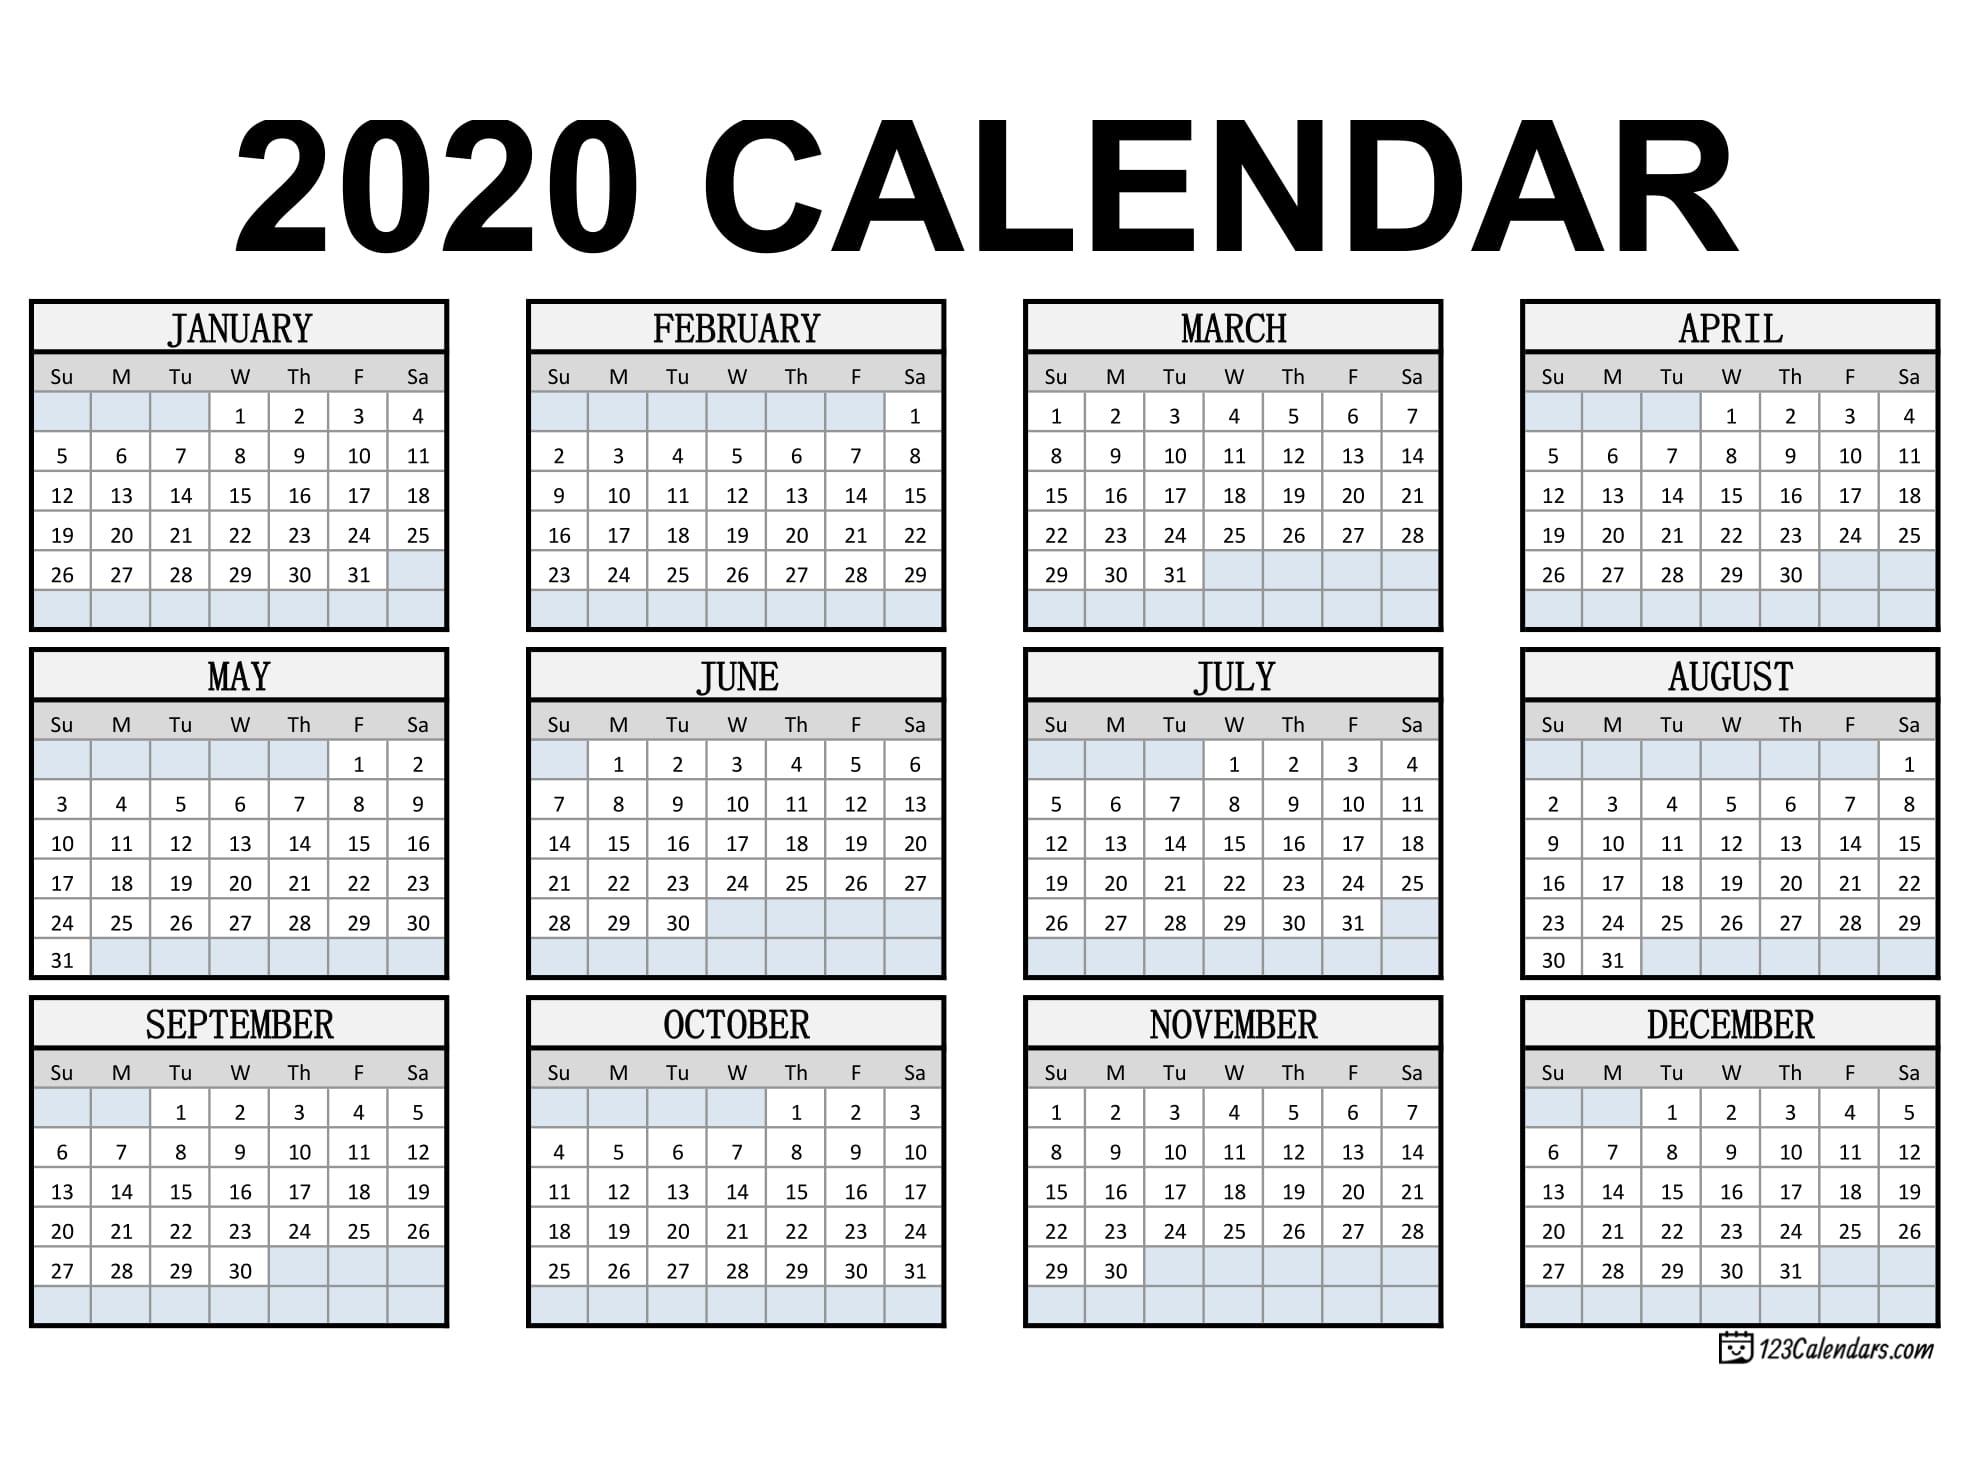 Free Printable 2020 Calendar | 123Calendars inside Legal Size Printable Monthly Calendar 2020